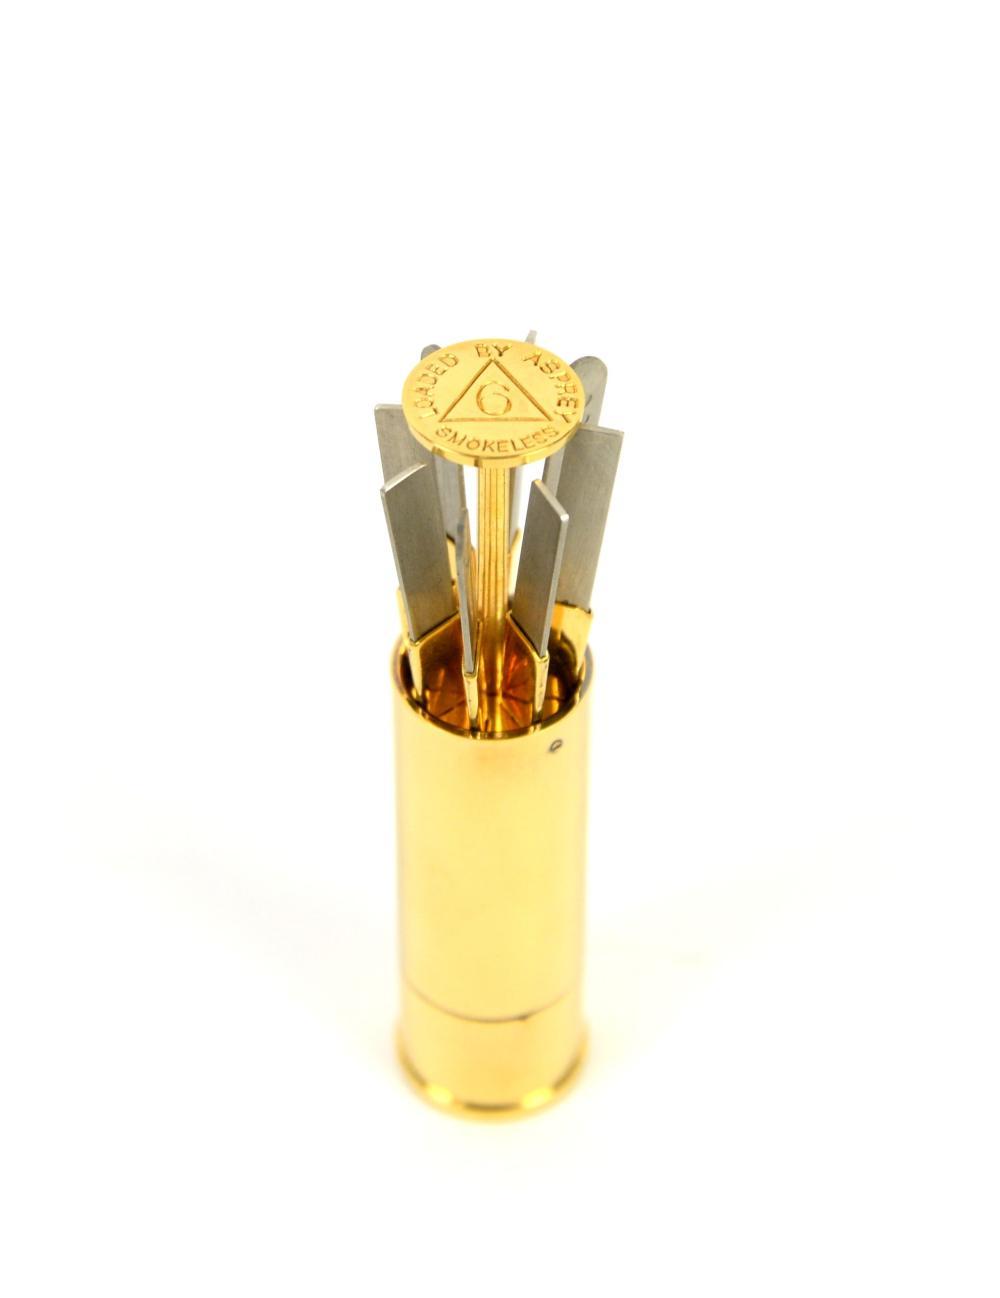 An Asprey shotgun place/butt marker, cylindrical f